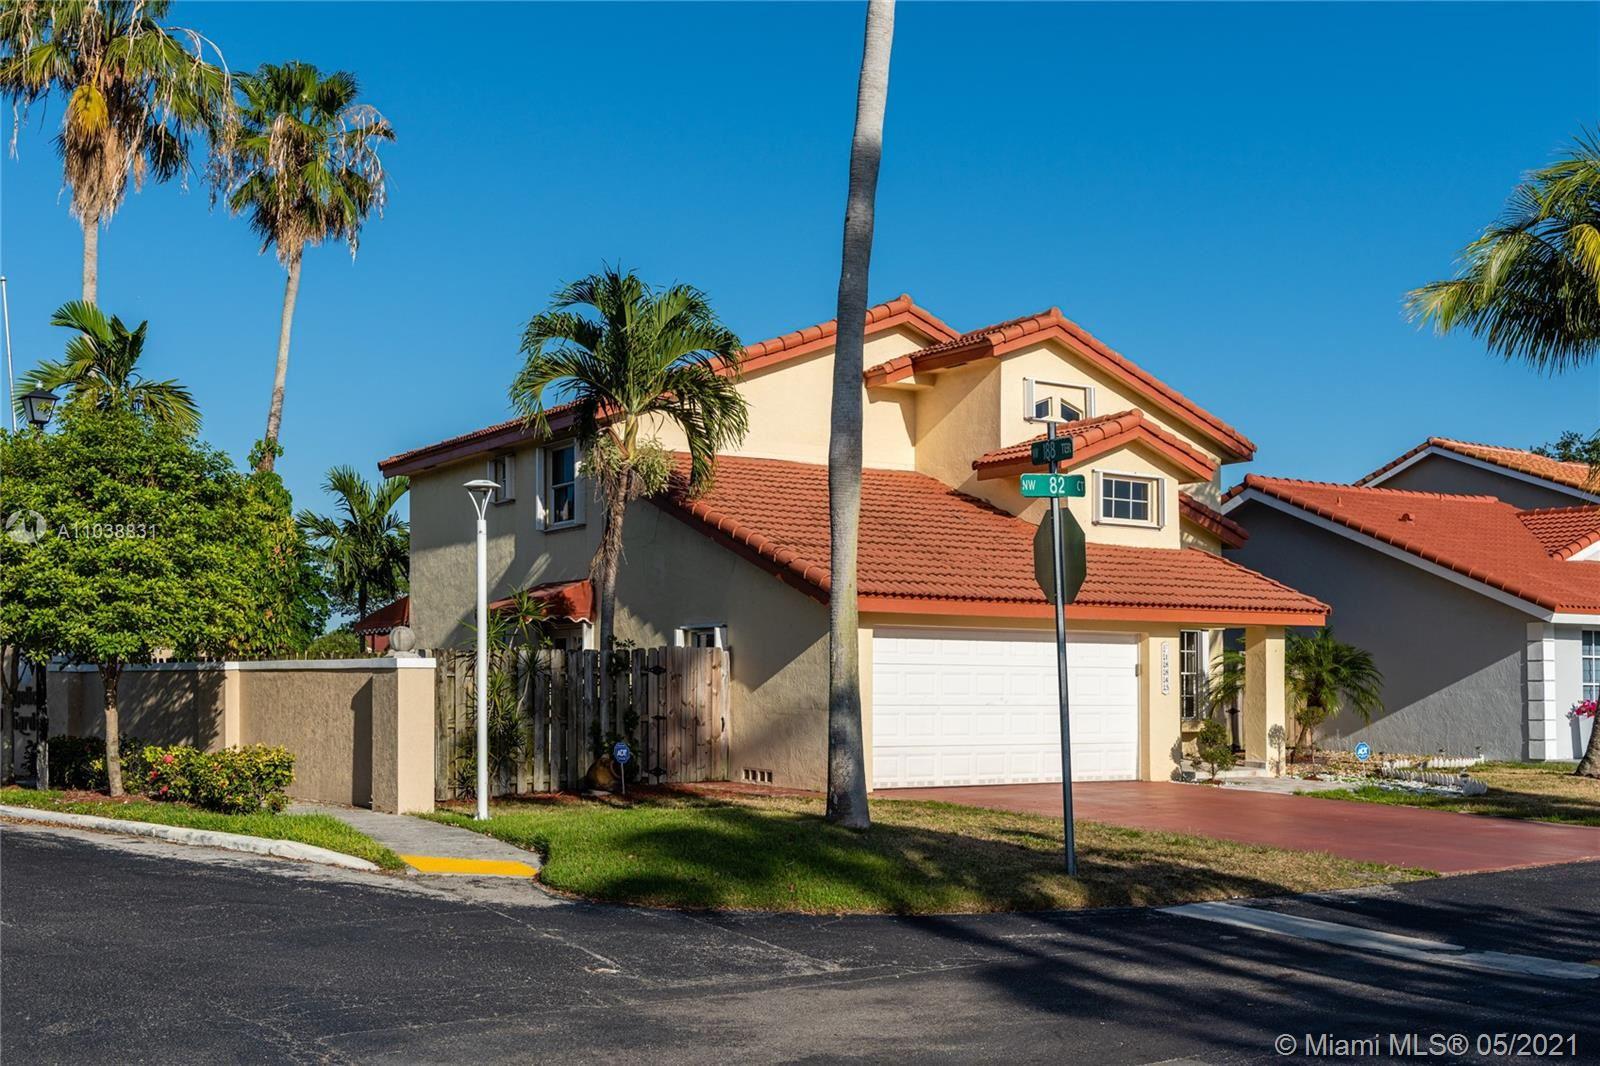 Photo of 18845 NW 82nd Ct, Hialeah, FL 33015 (MLS # A11038831)